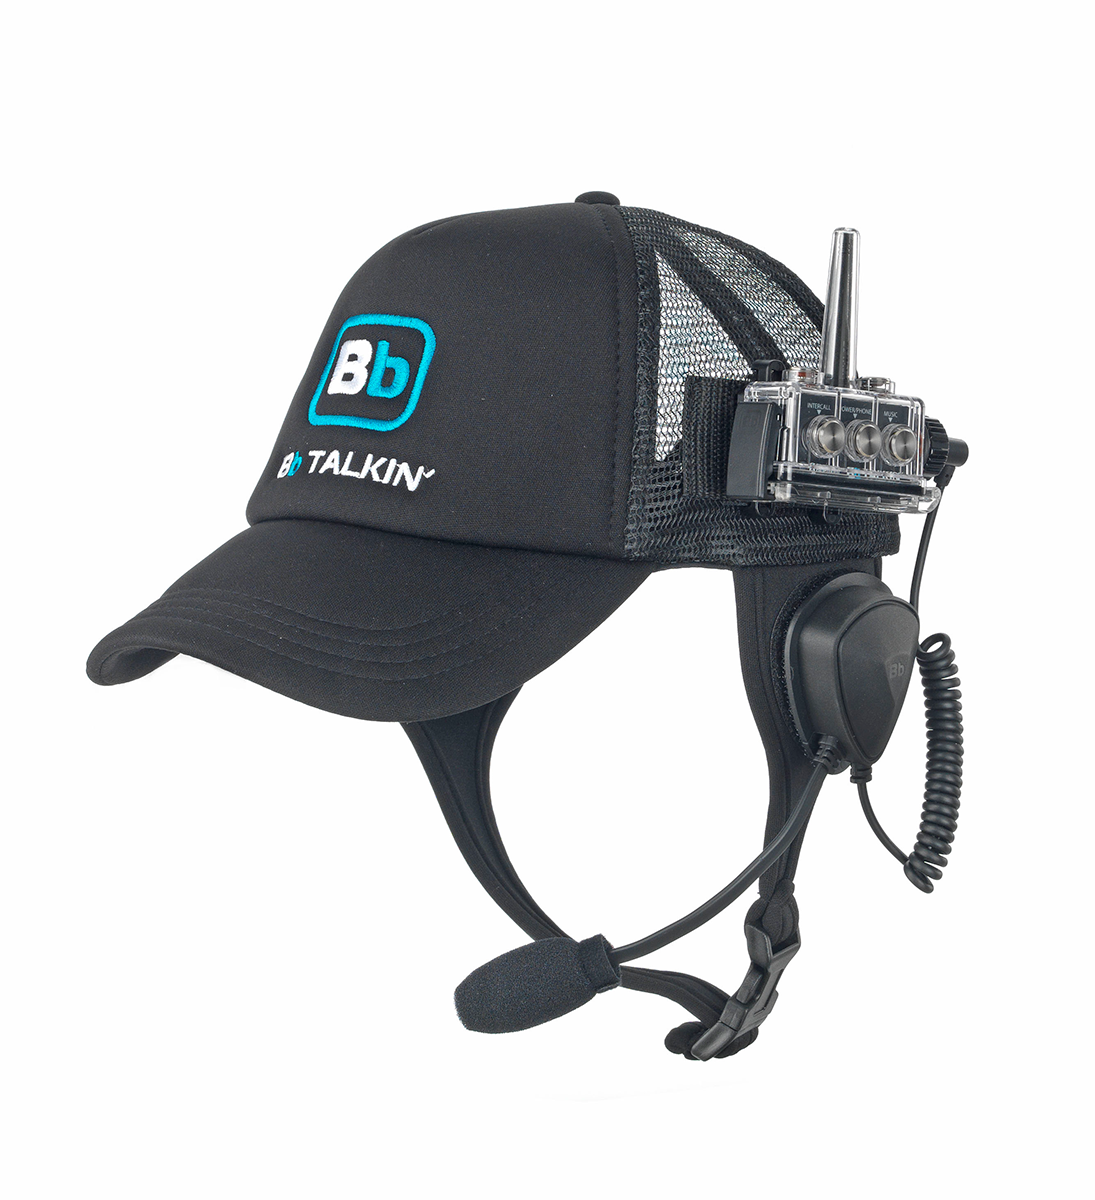 BbTALKIN USA's 100% waterproof baseball cap with microphone